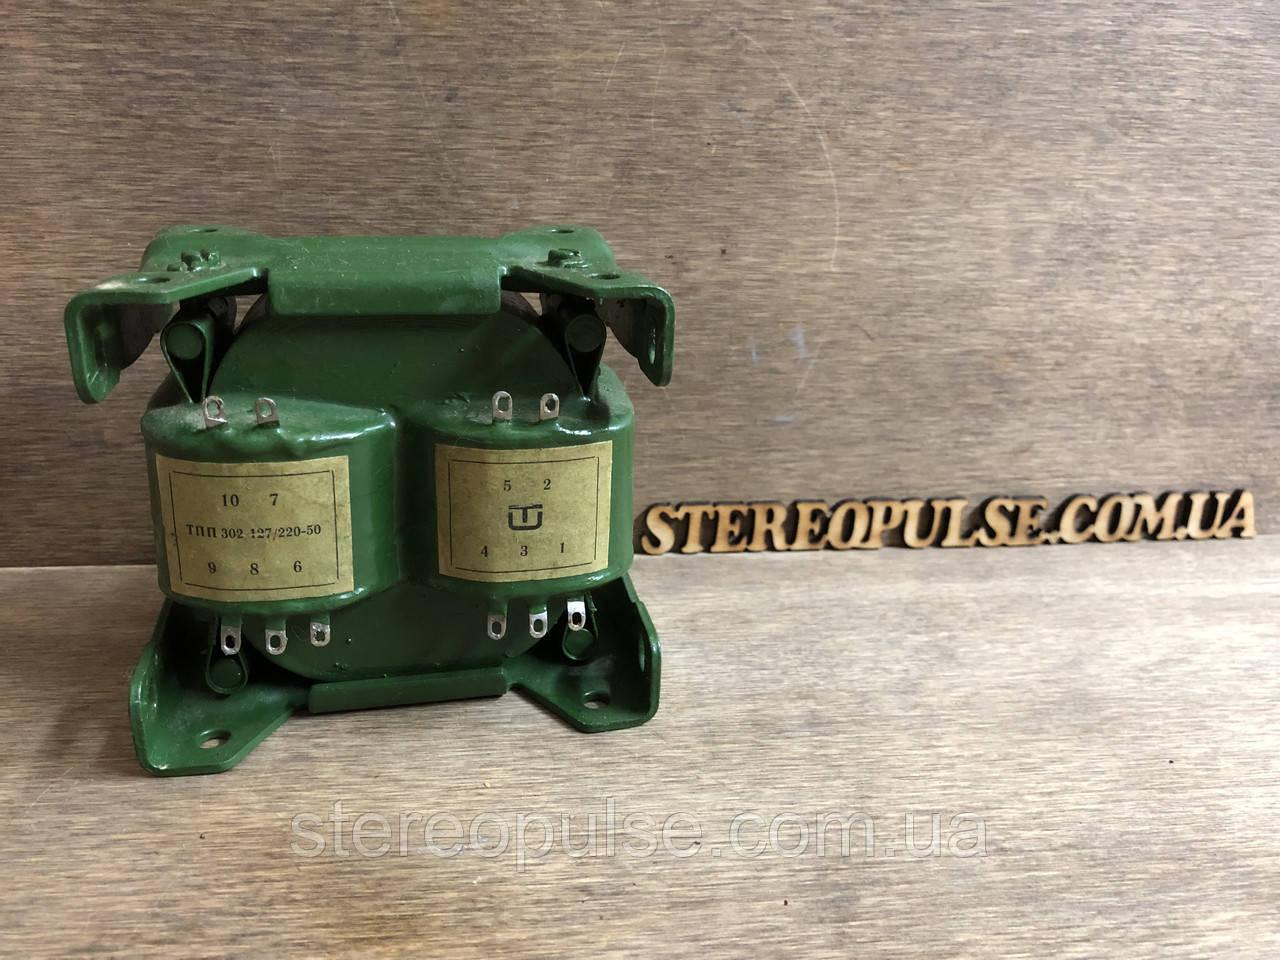 Трансформатор ТПП302 127/220-50